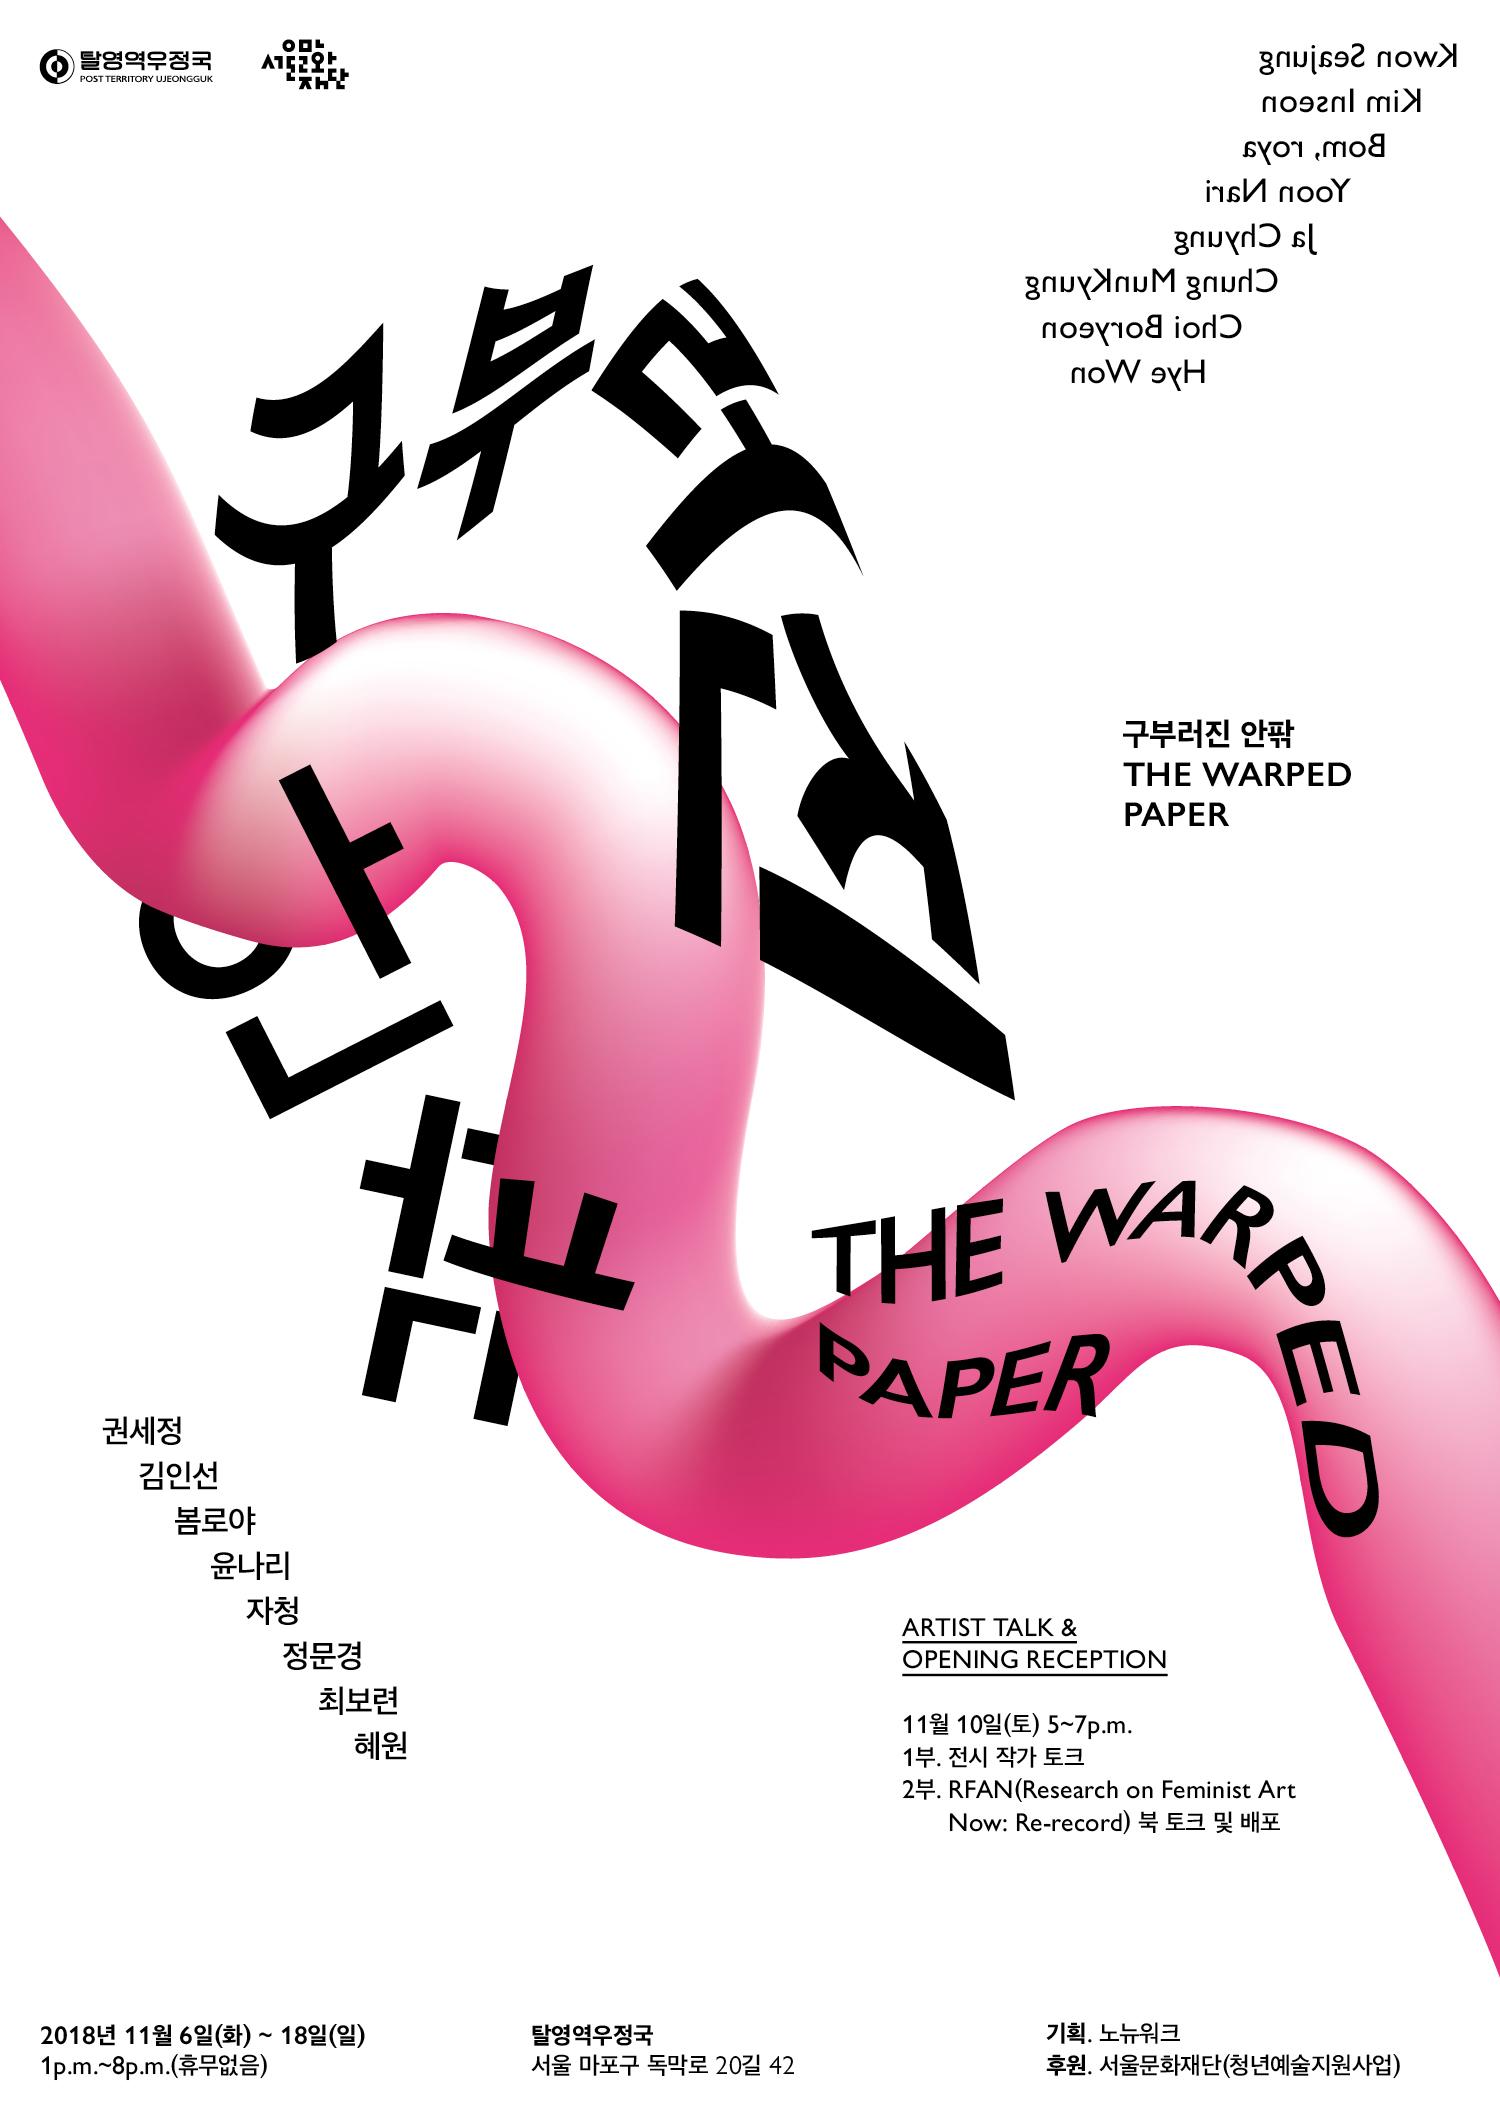 web poster 2